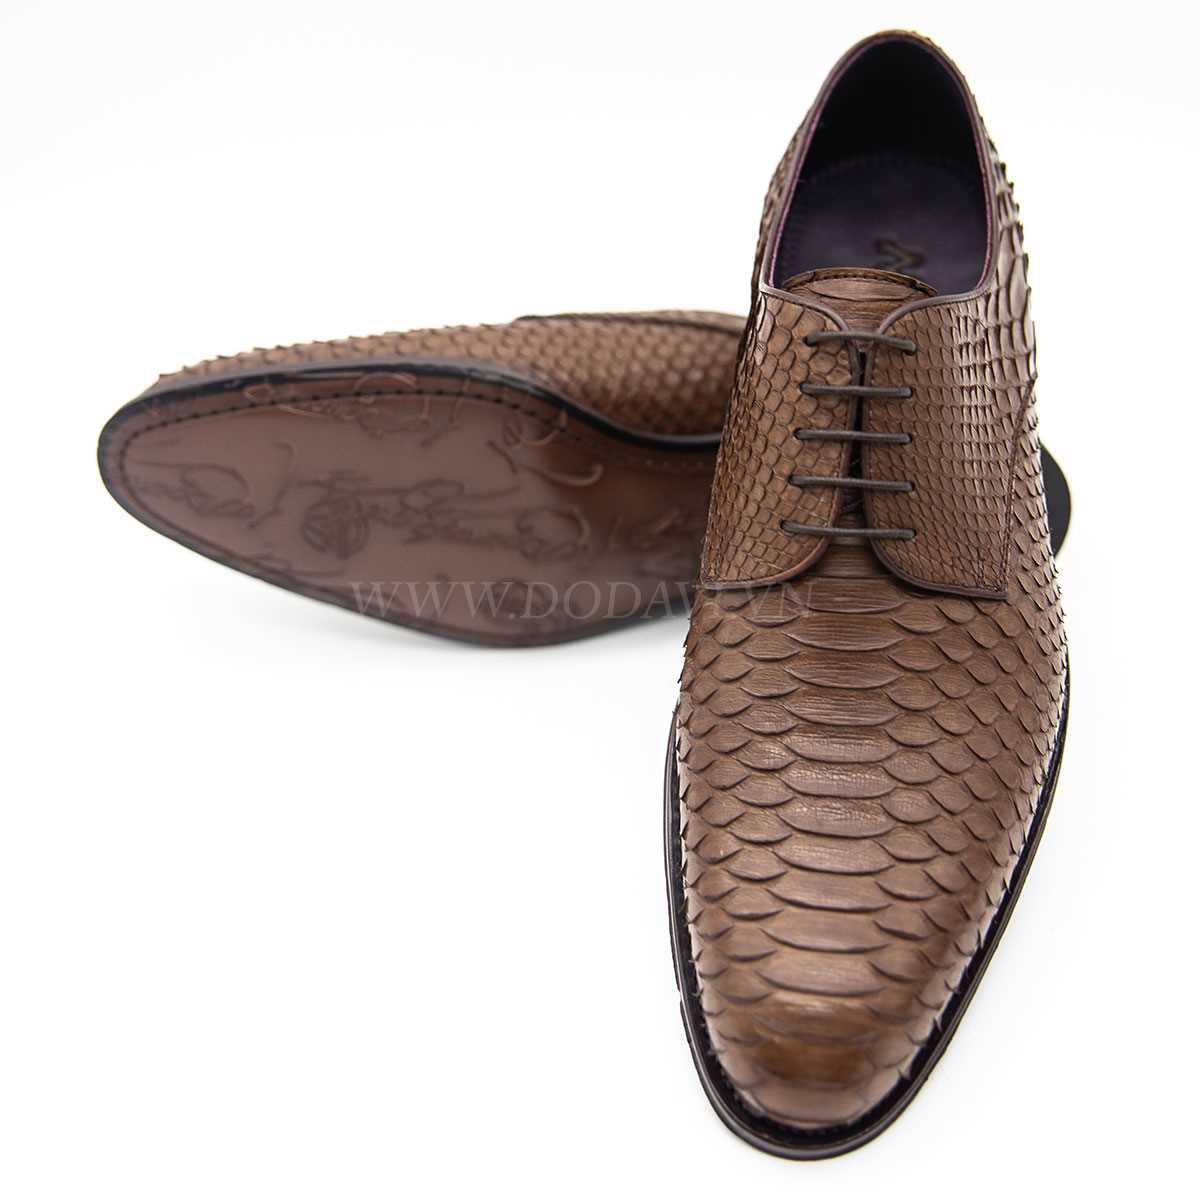 Giày da trăn 10898486